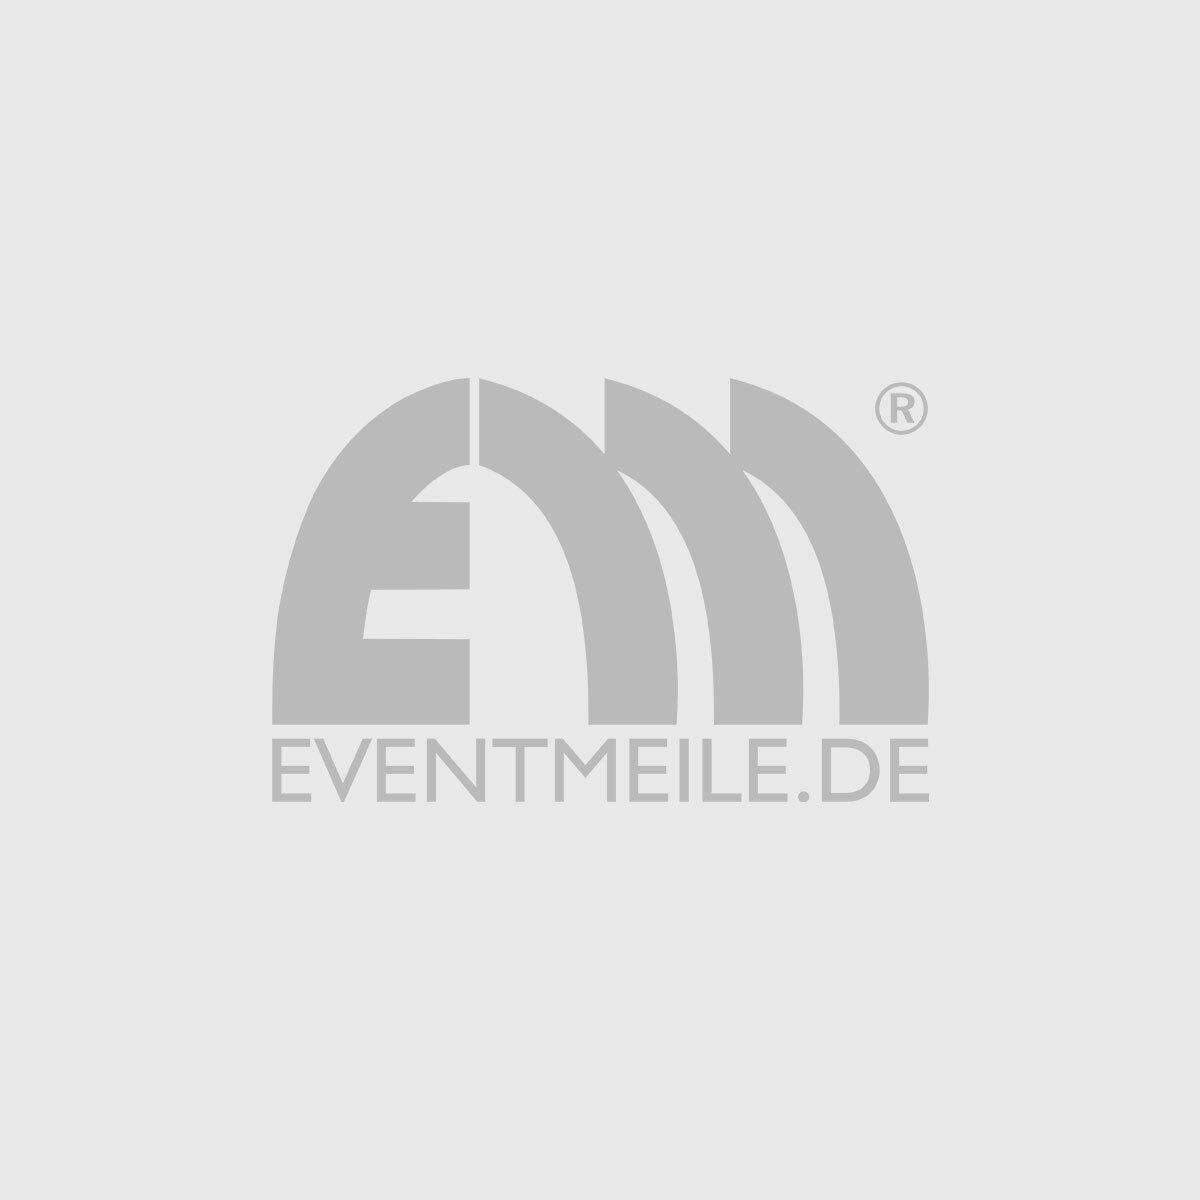 Stromverteiler 16A 400V – 3×230 V